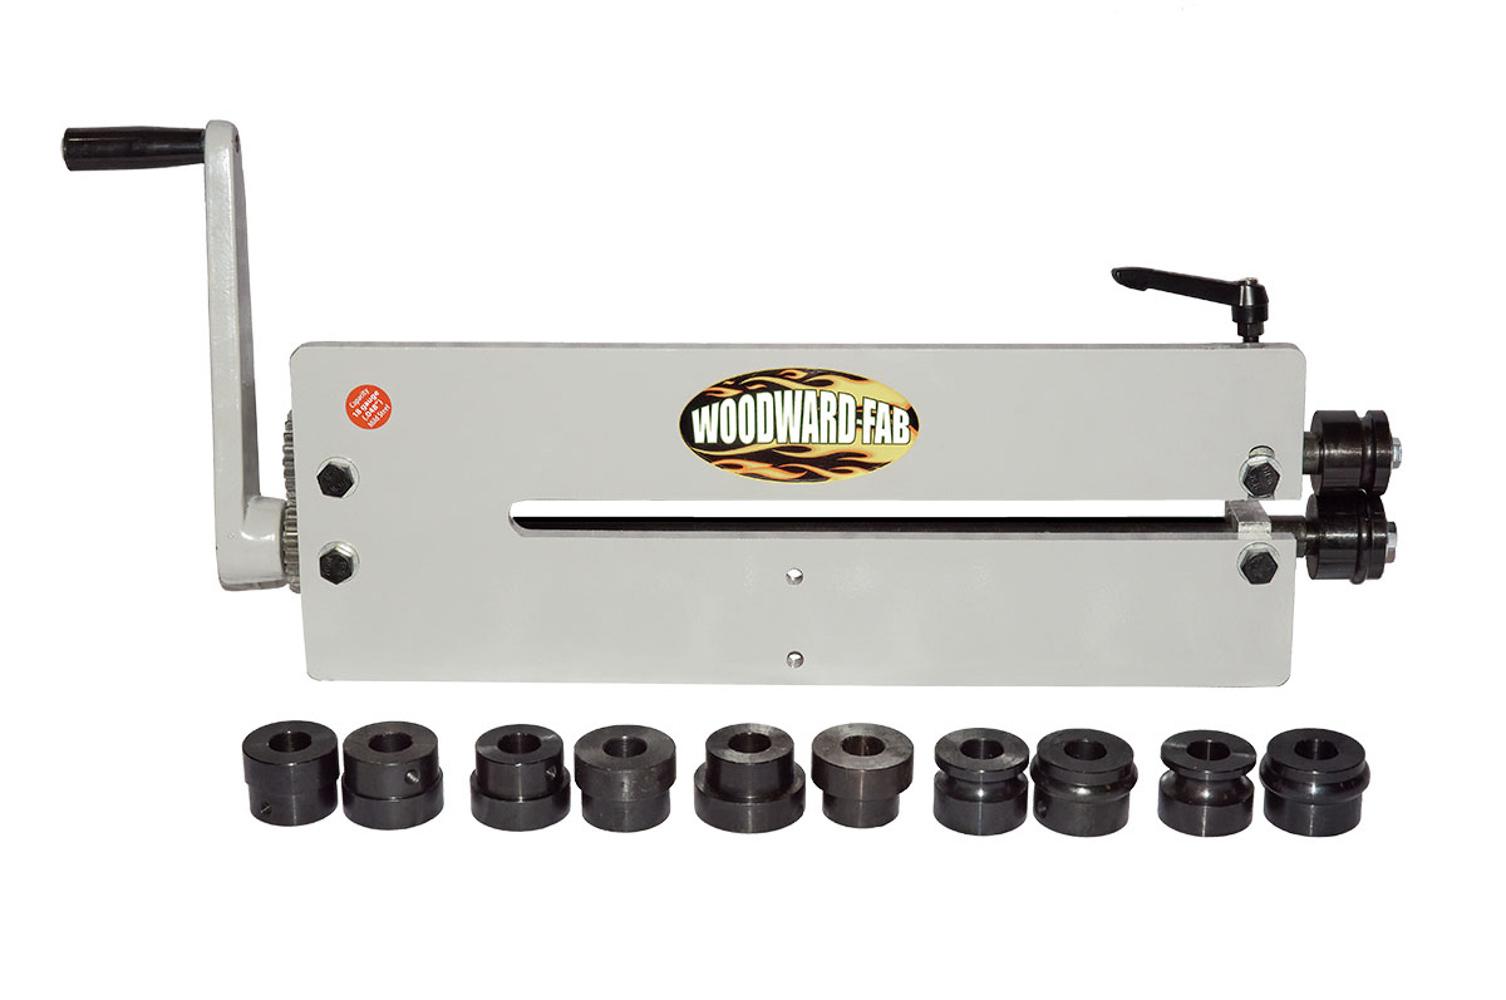 Woodward Fab WFBR6 Bead Roller, 18 Gauge Material Maximum, Manual Control, Dies Included, Steel, Gray, Kit